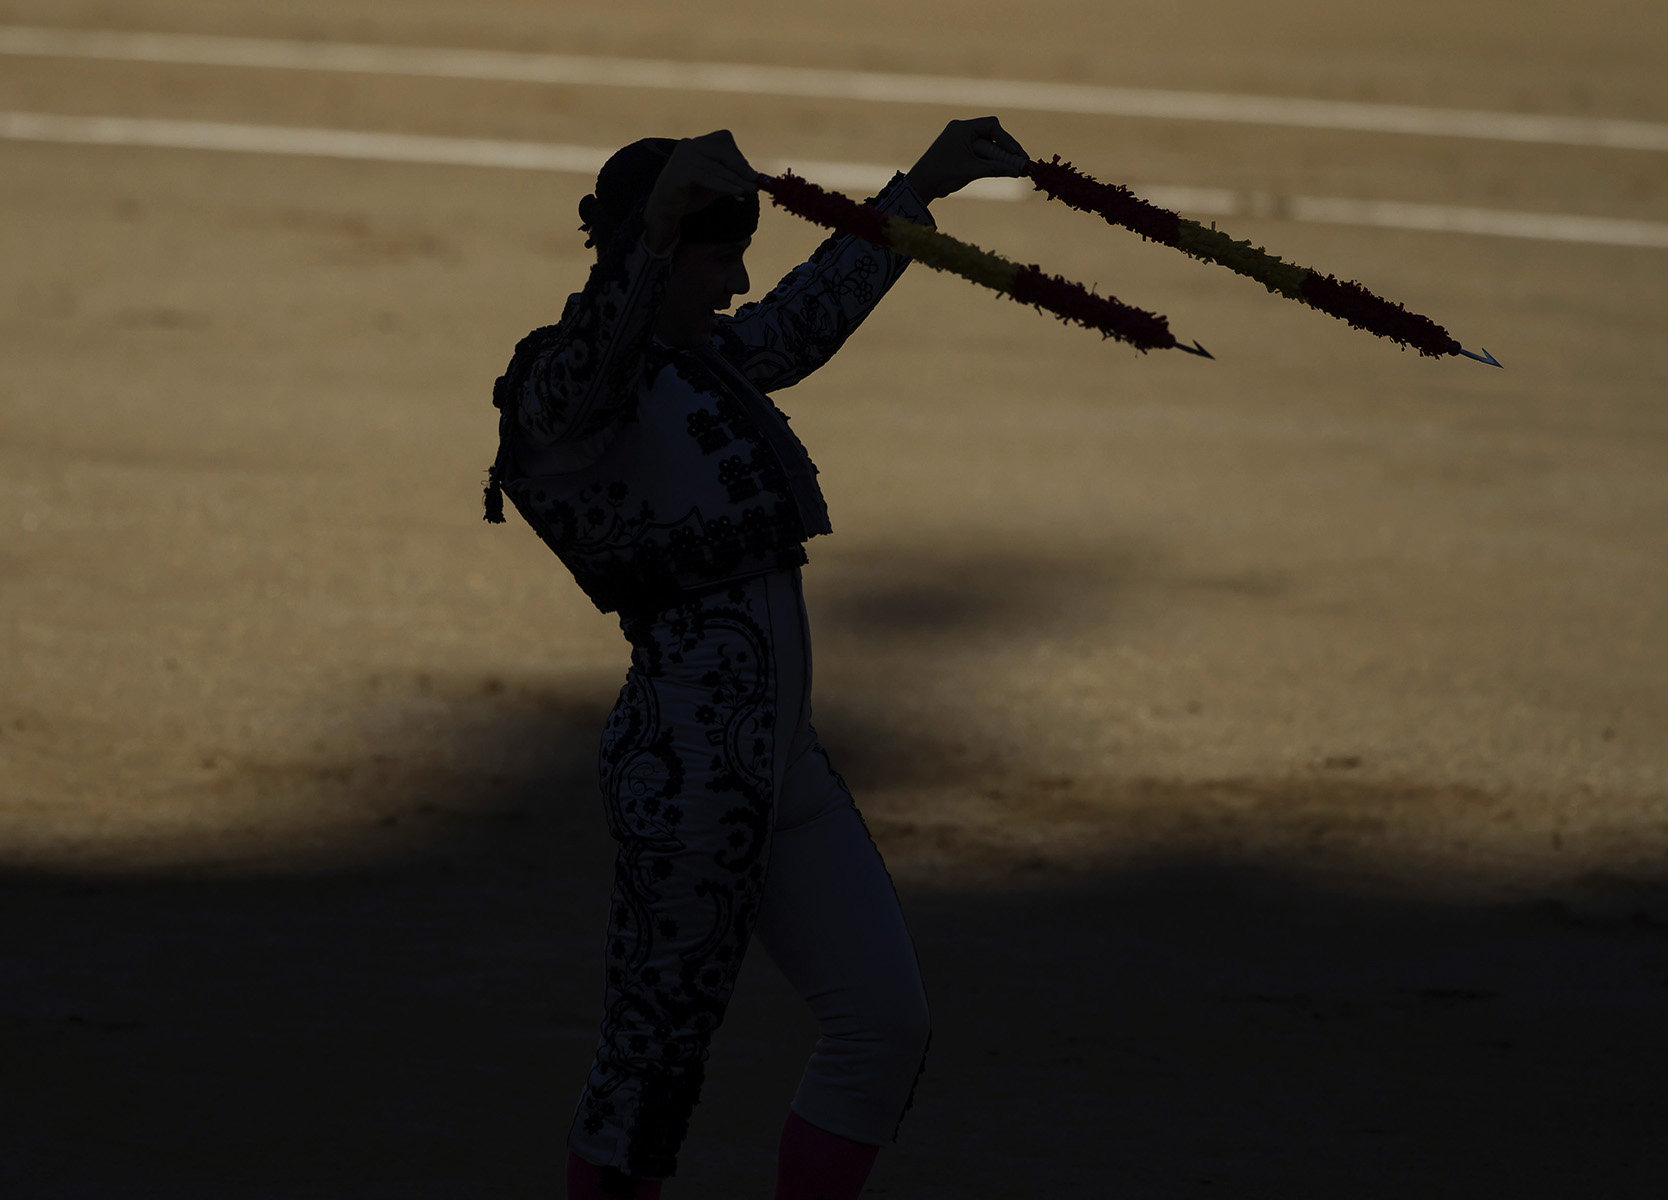 Novillada en las VentasAntonio Puerta + Juan Millan + Cesar Valencia© Alberto R. Roldan /  Razon30 07 2014